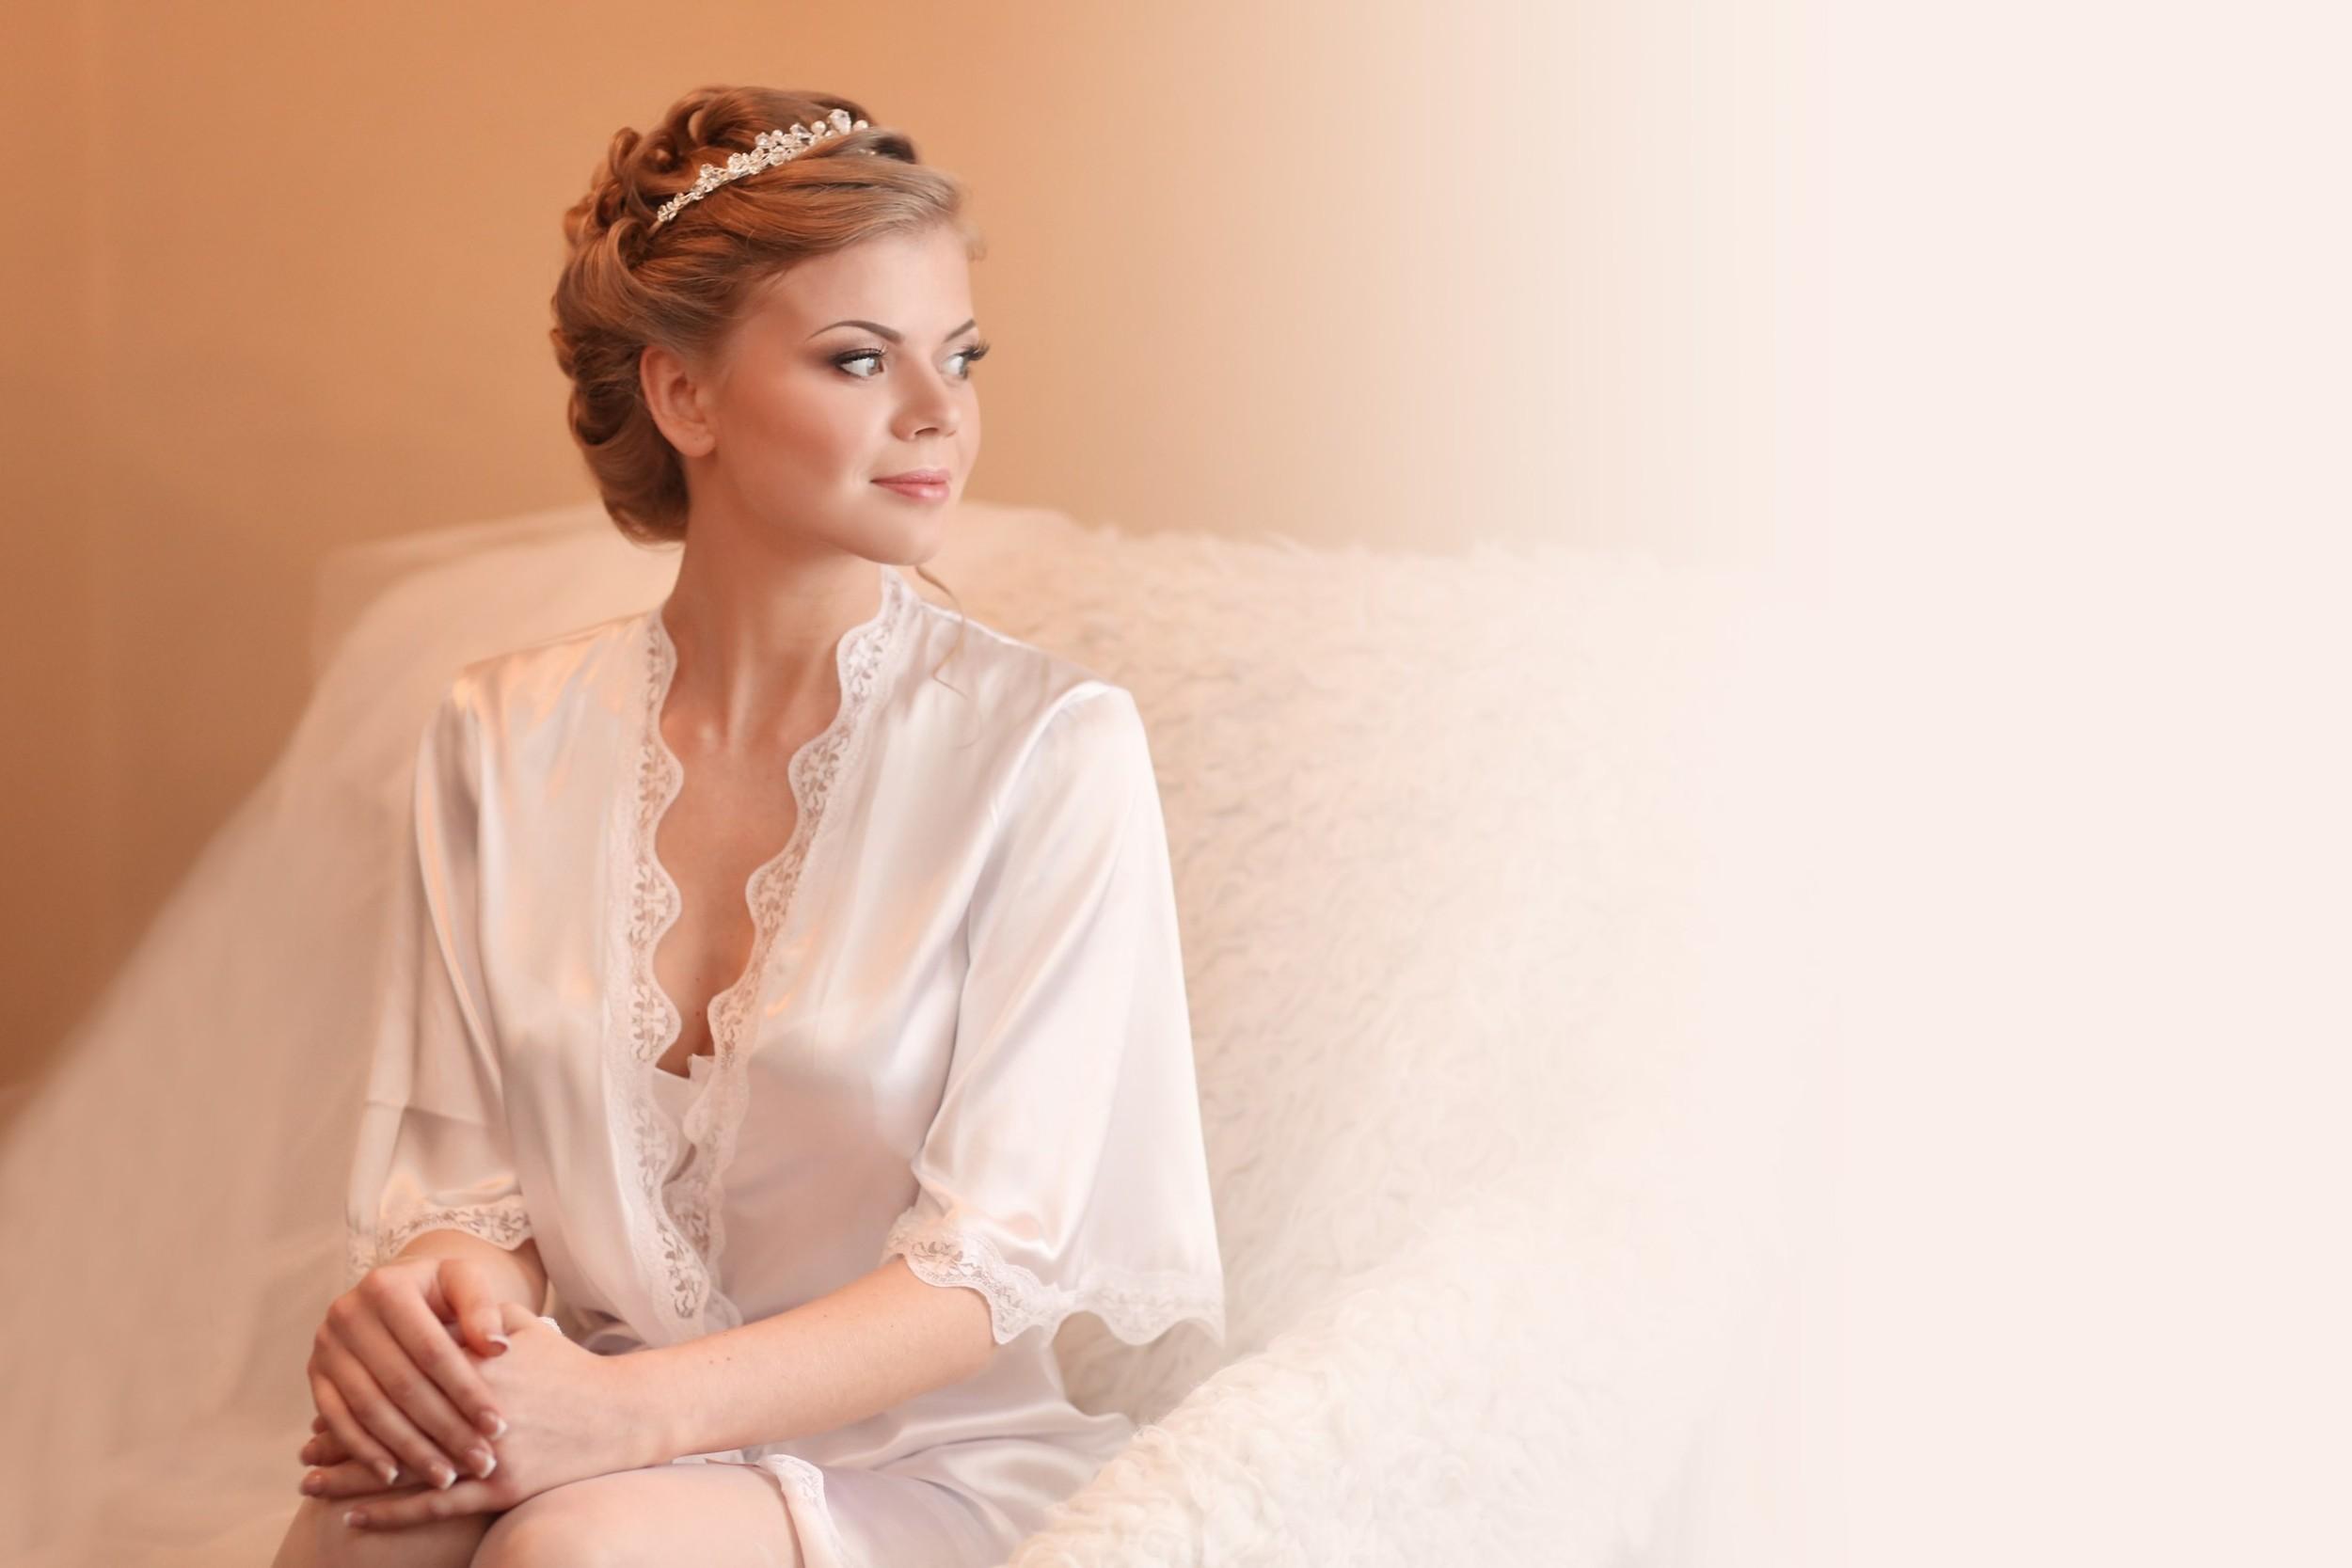 Erina patterson wedding